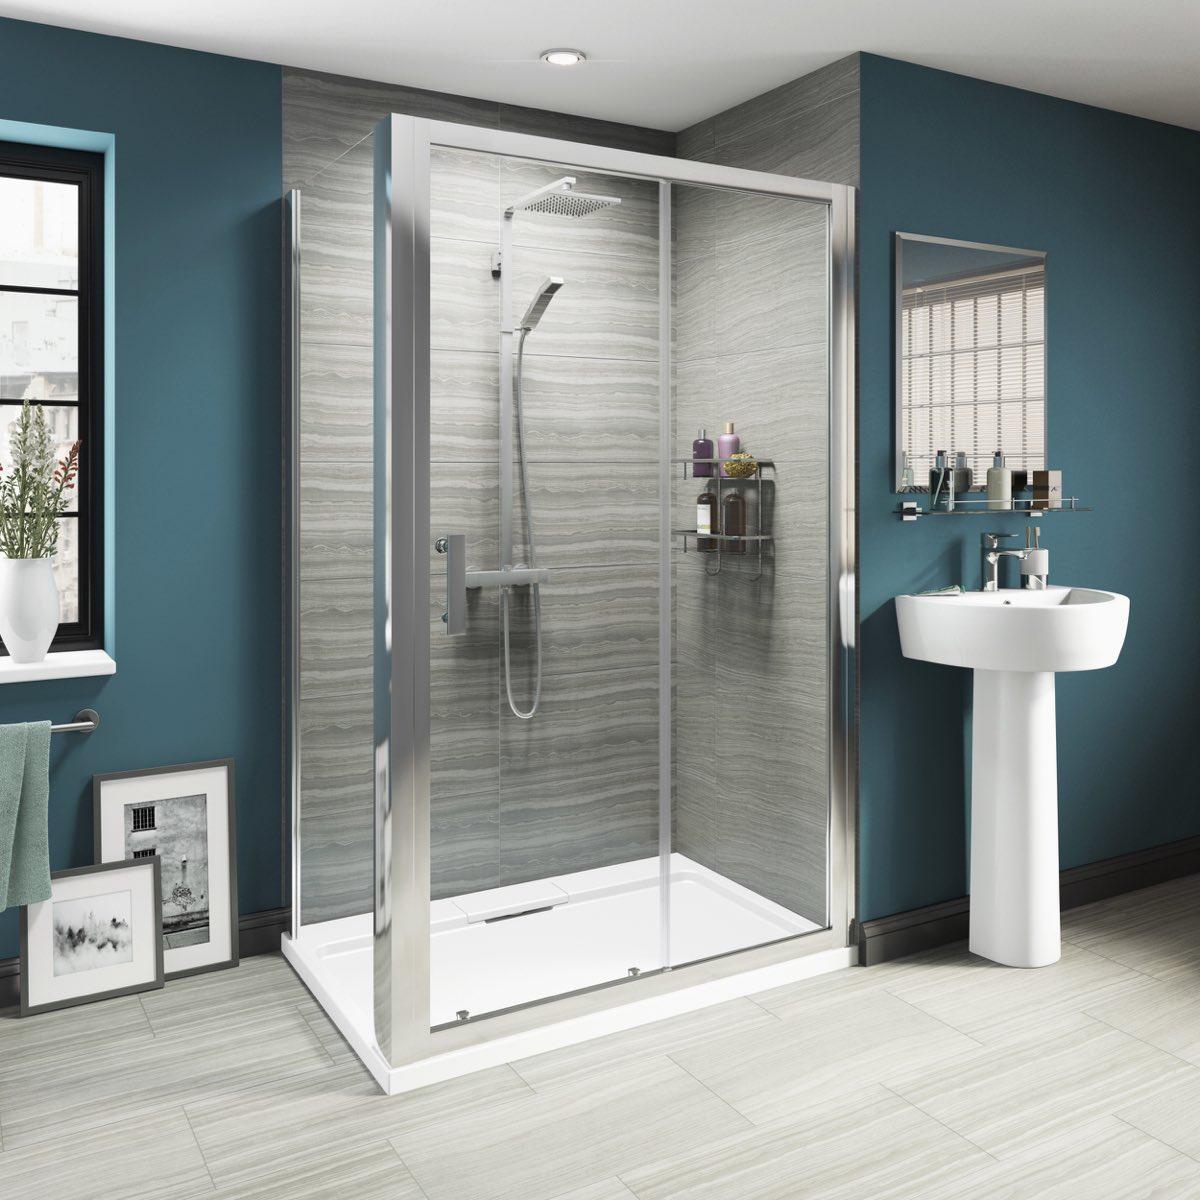 Luxury 8mm sliding shower enclosure 1400 x 800 - Luxury shower cubicles ...